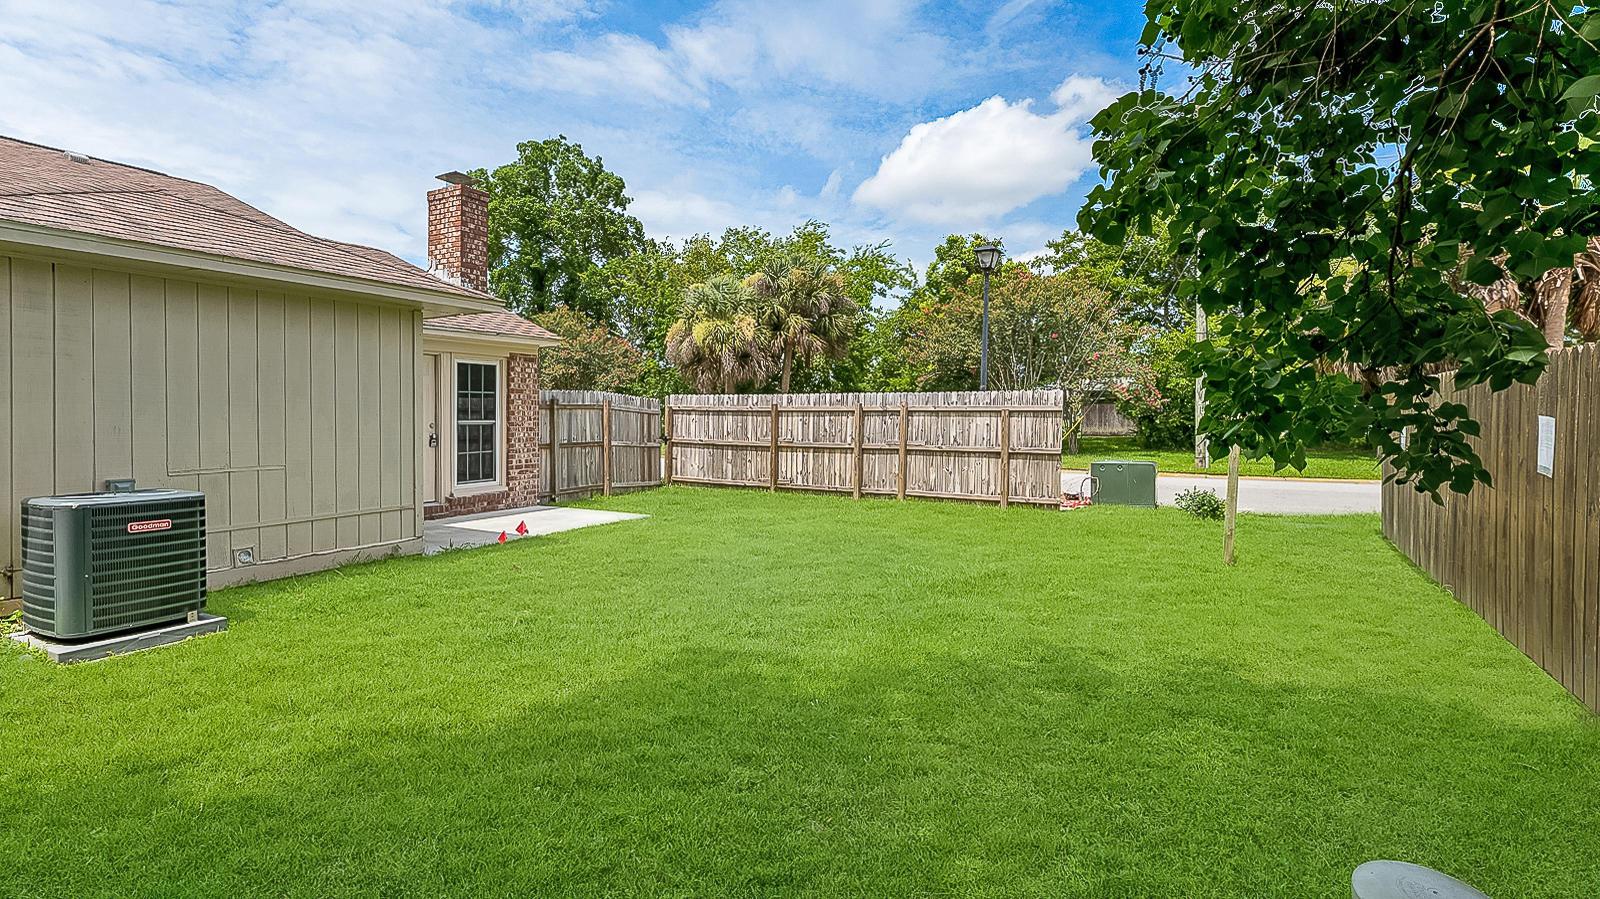 Ashley Villas Homes For Sale - 4315 Briarstone, North Charleston, SC - 12